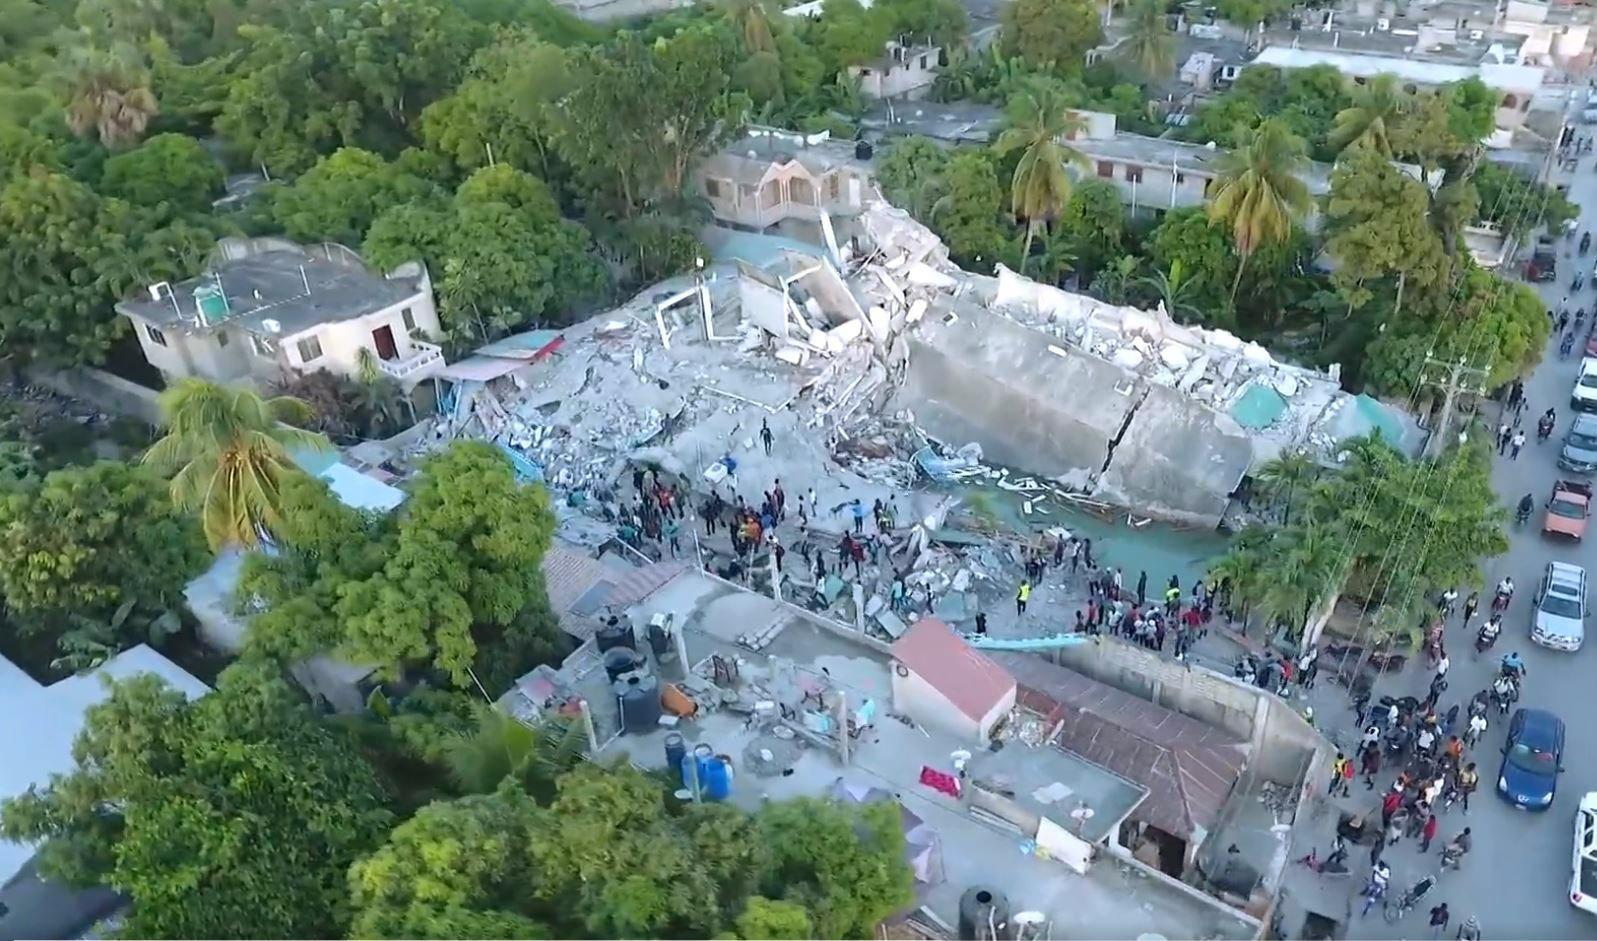 Drone video shows devastation left in wake of 7.2-magnitude earthquake in Haiti